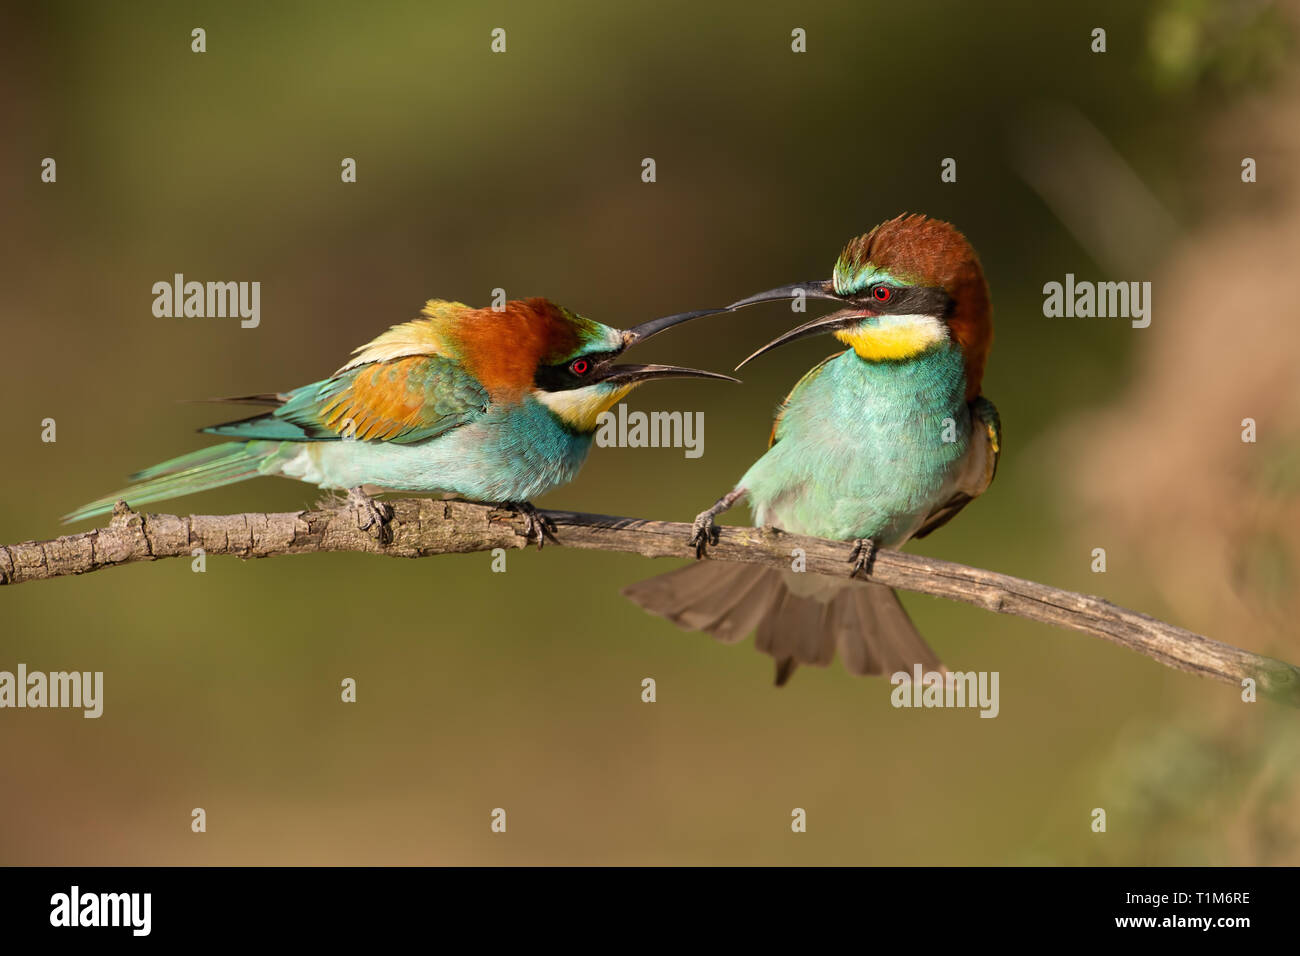 Pareja de abejarucos europeo, Merops apiaster combates. Dos coloridas aves de aspecto exótico tener un conflicto. Acción paisaje silvestre. Foto de stock